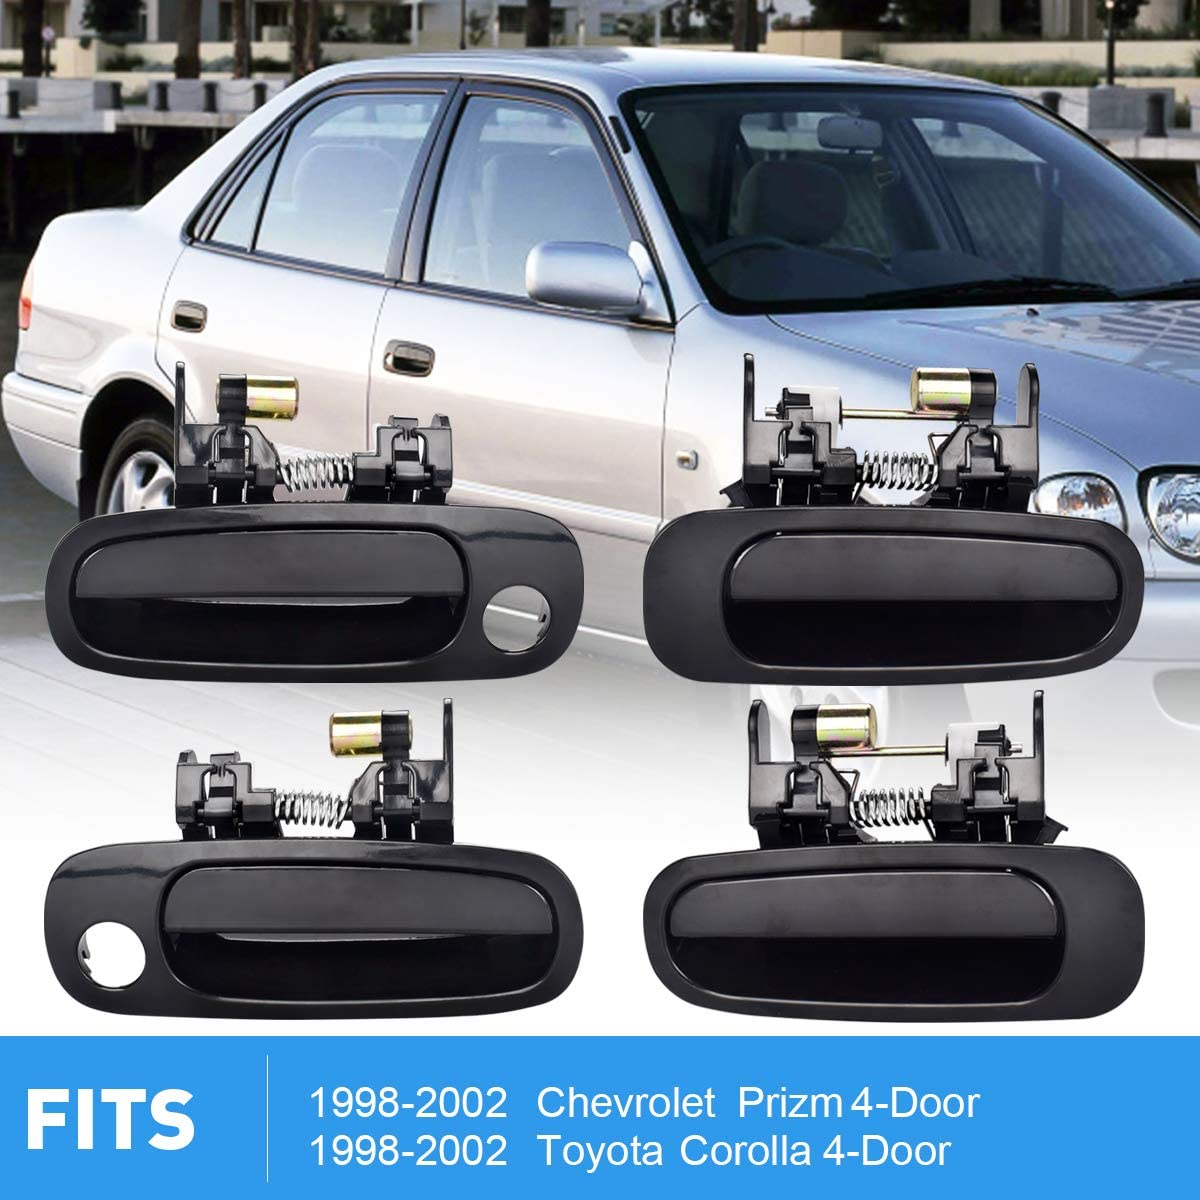 Autex 2pcs Interior Exterior Front Left Door Handles Compatible With Toyota Corolla Chevrolet Prizm 1998 1999 2000 2001 2002 Door Handles Driver Side 79500 80890 77563 80423 Door Handles